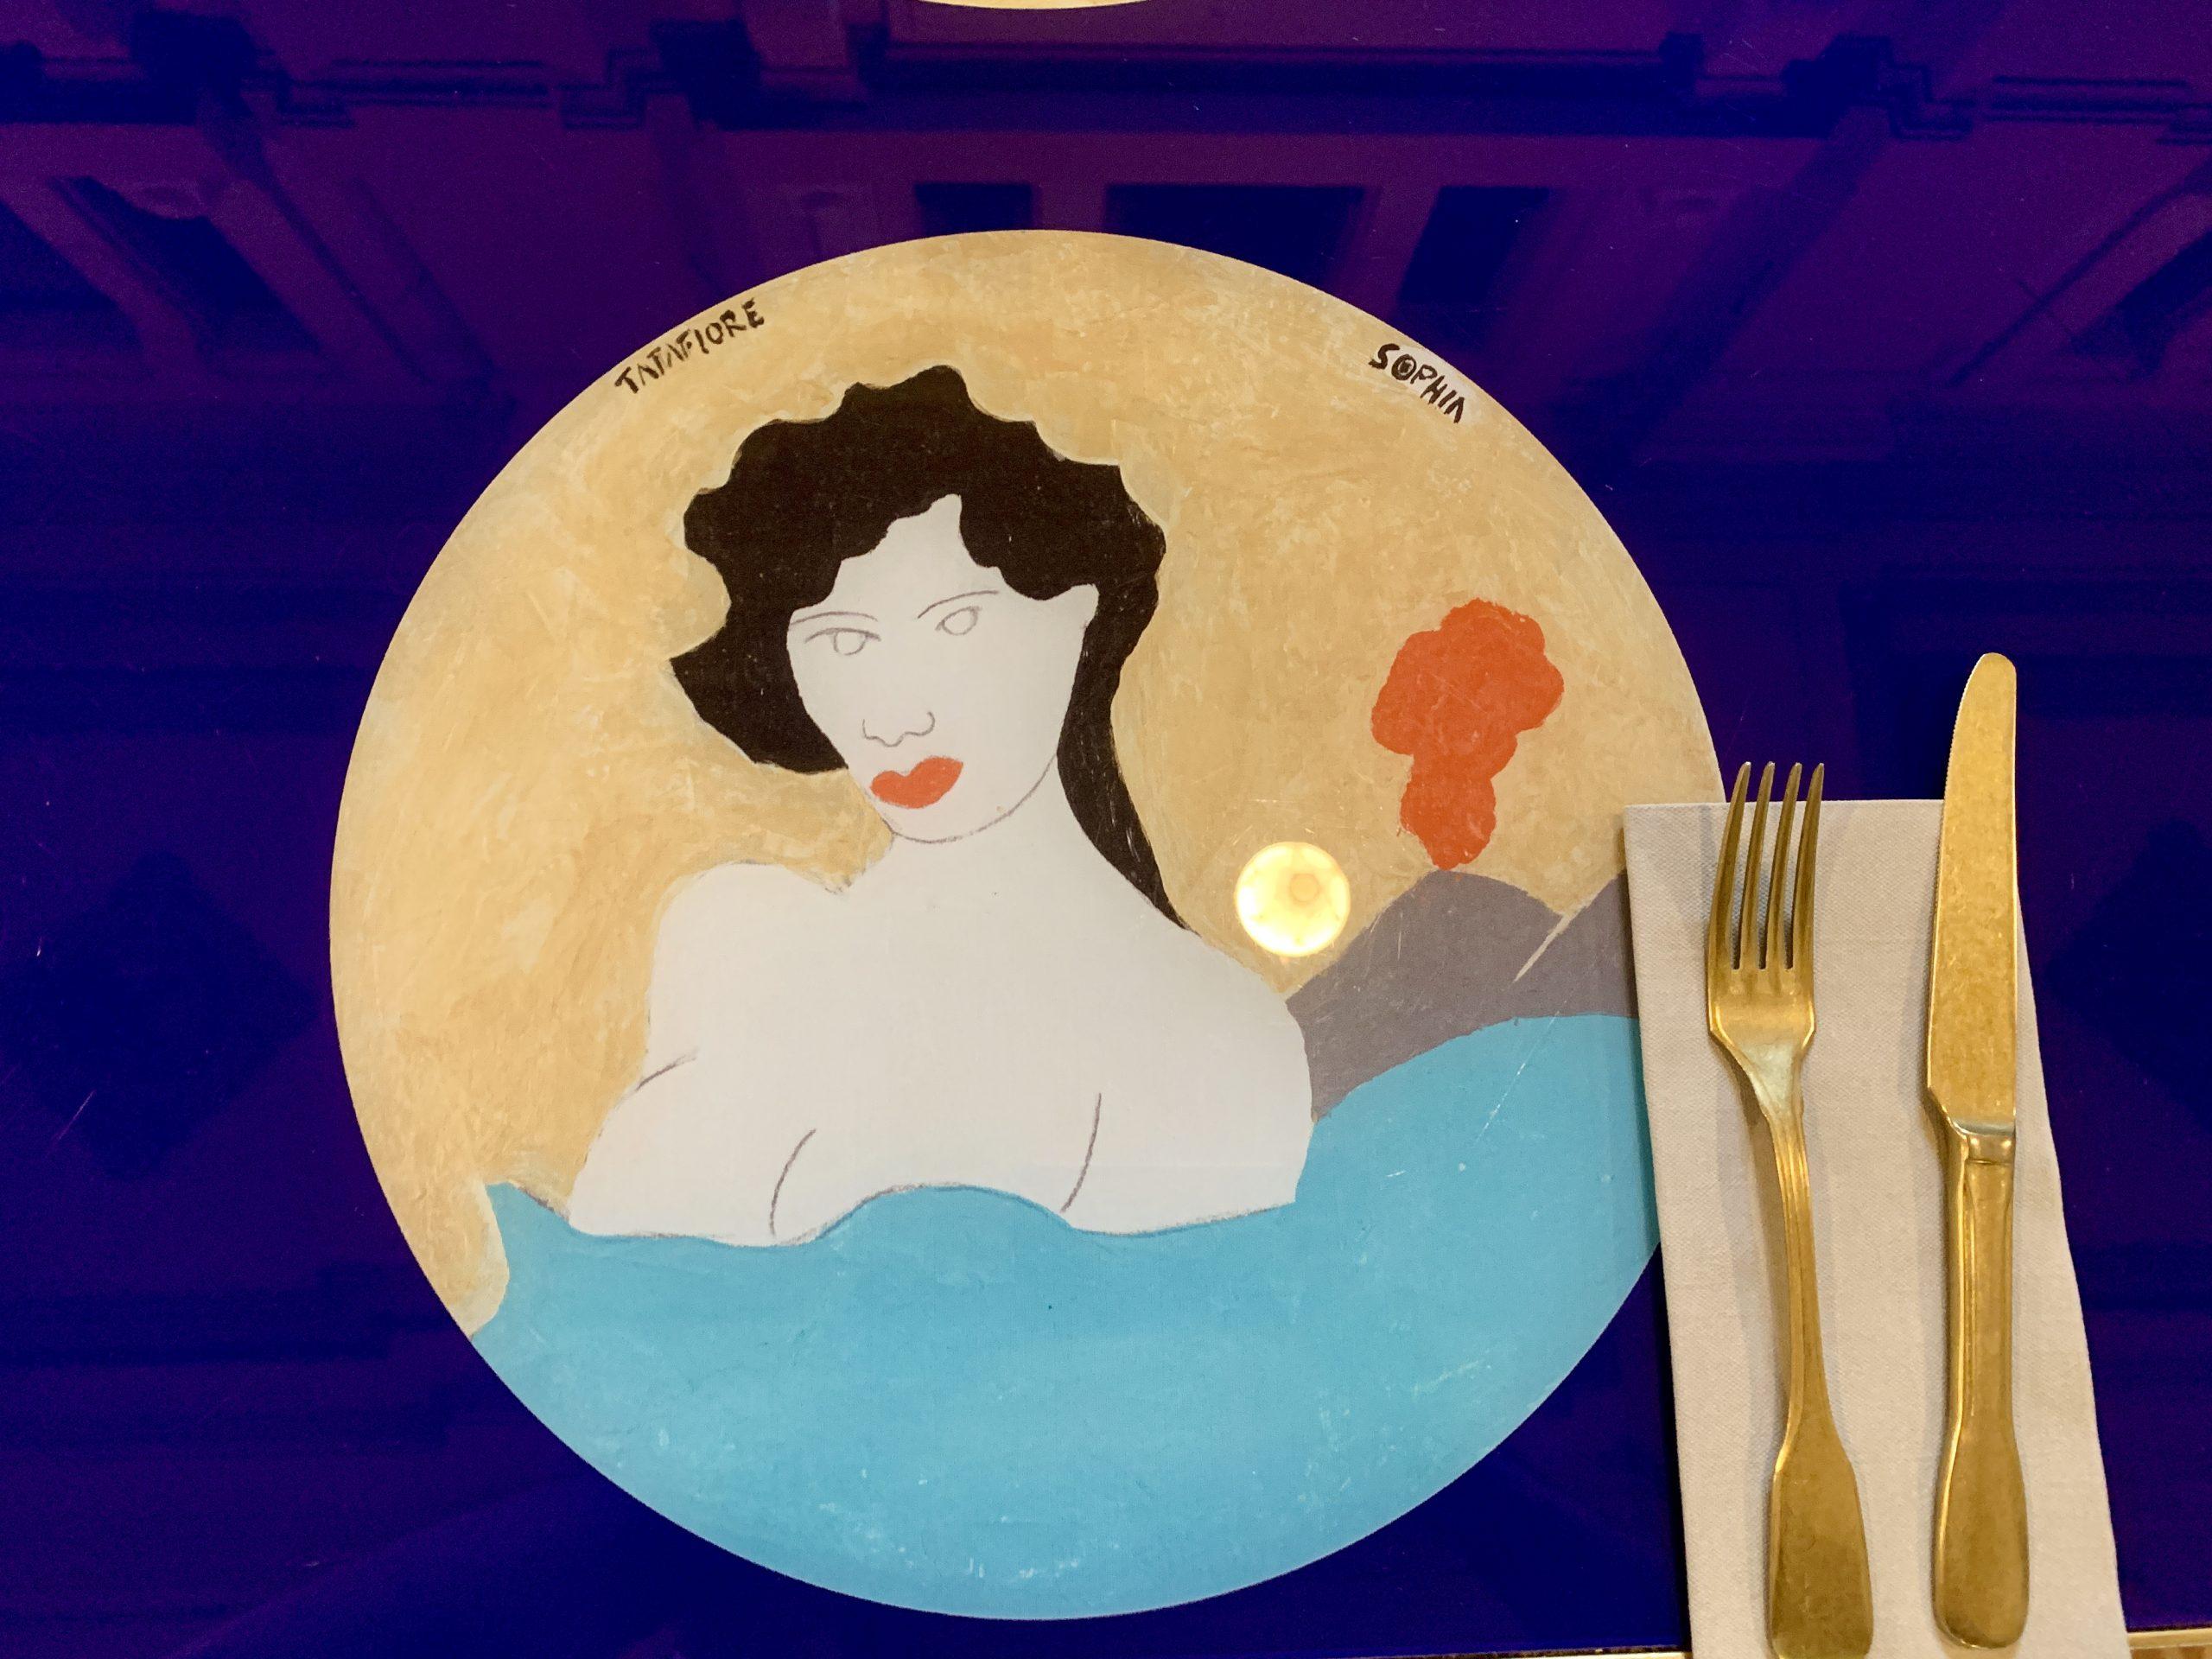 Mise en place (Sophia Loren Original Italian Food)